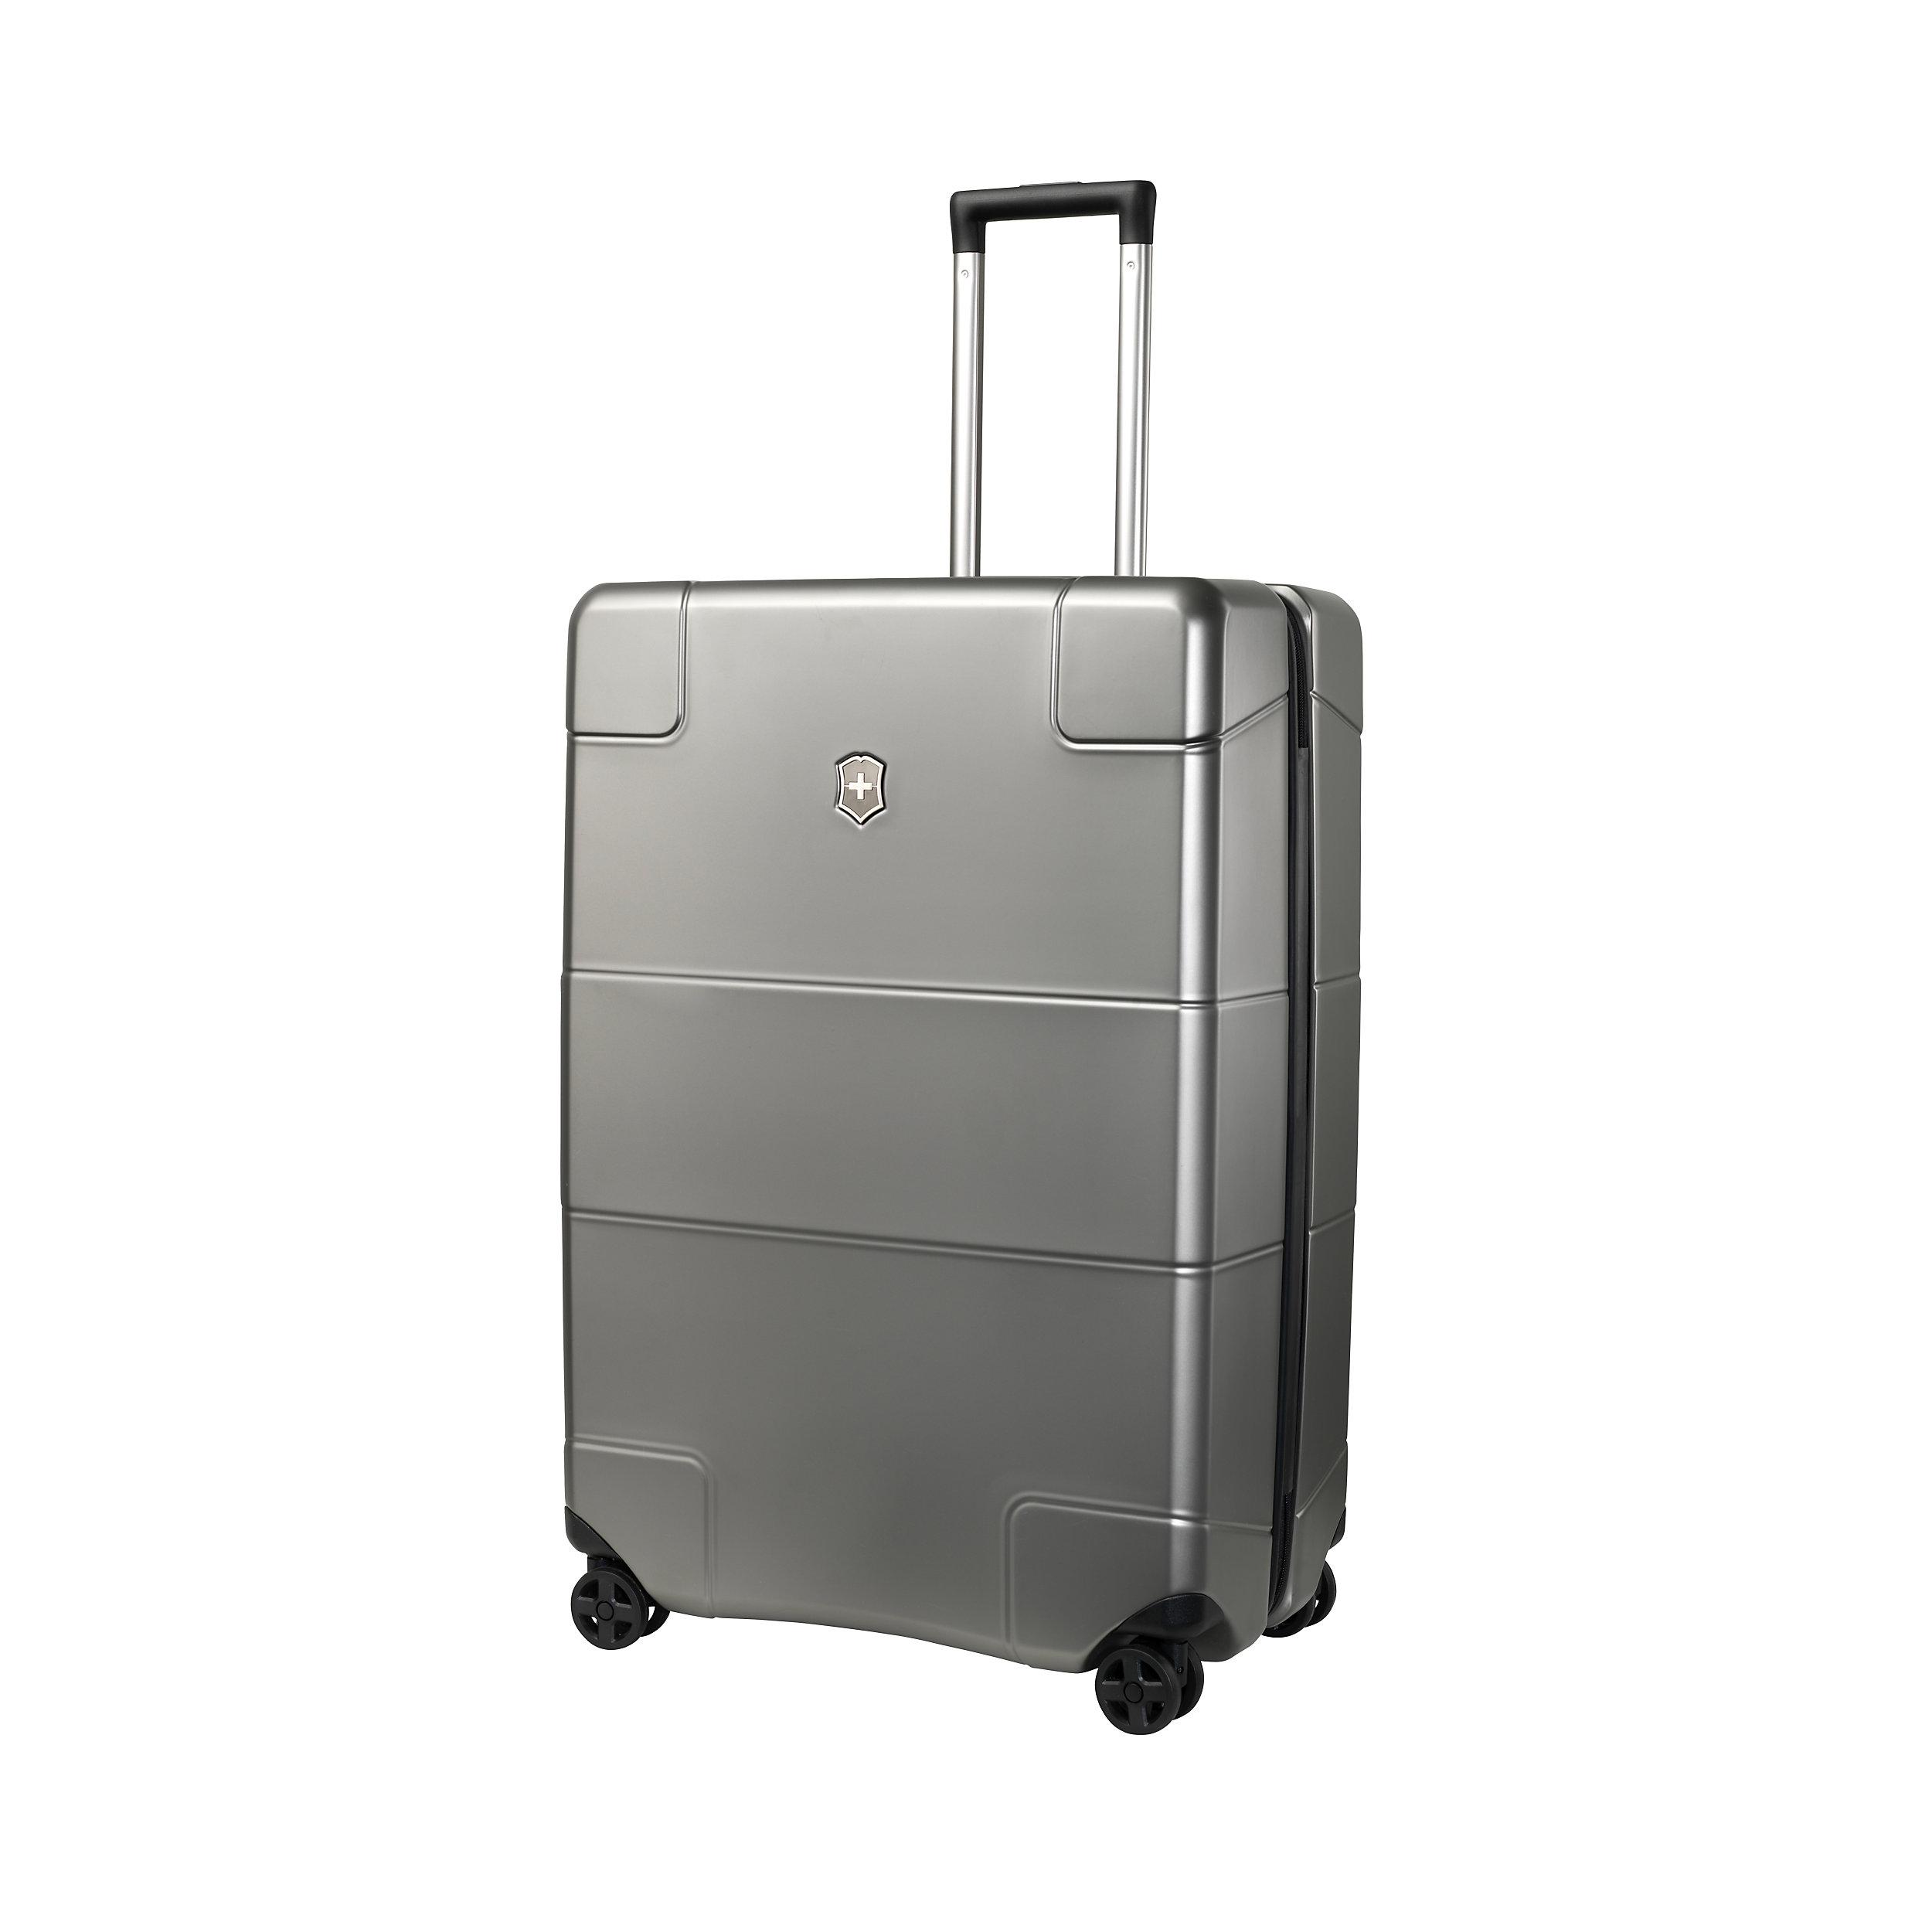 Trolley mit 4 Rollen 75cm Lexicon Hardside L 105 Liter